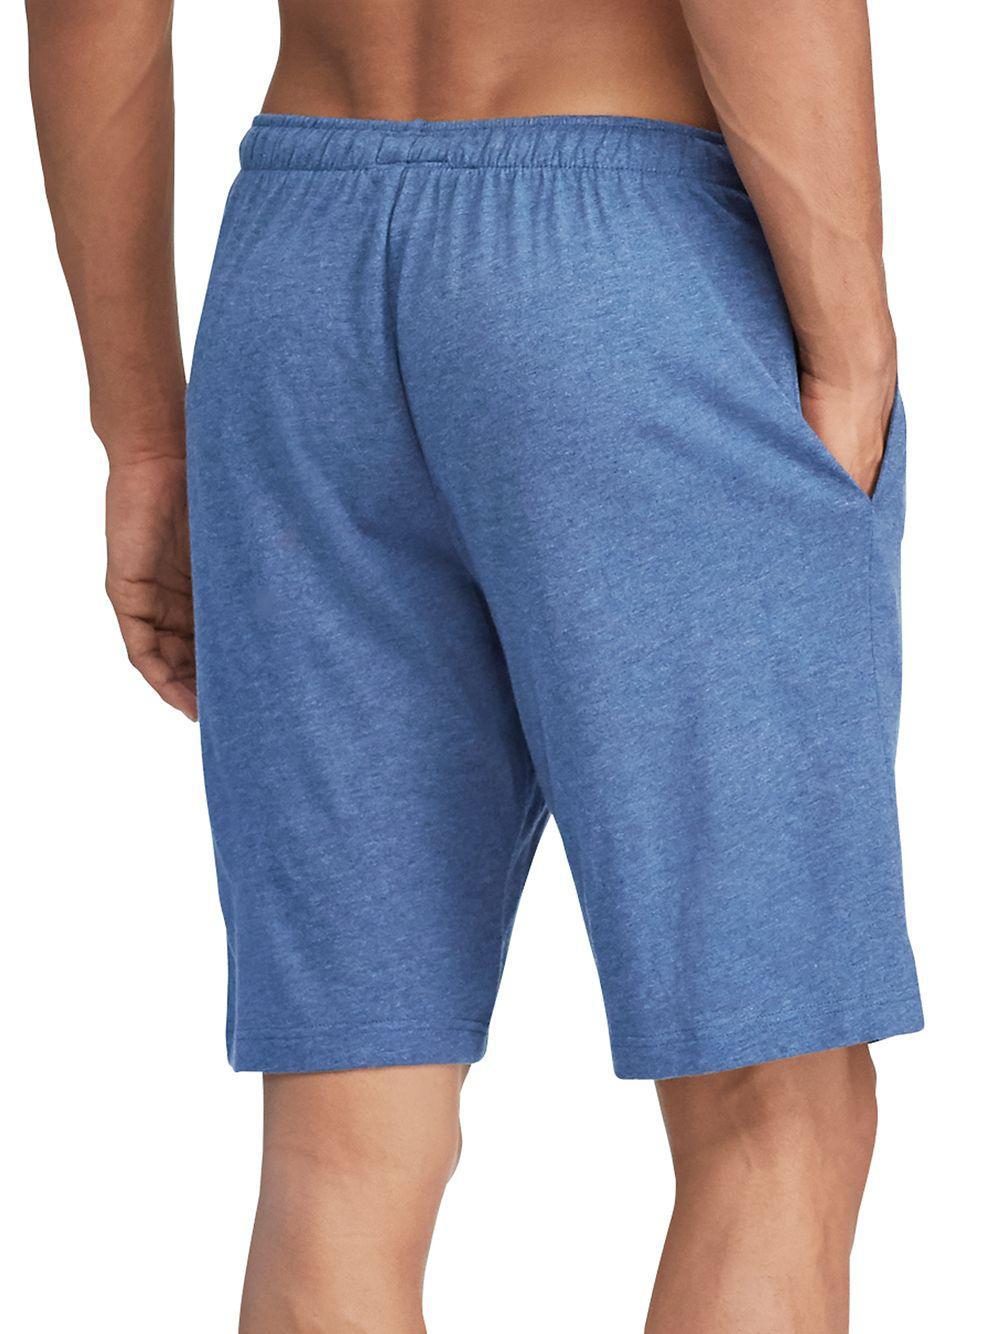 Ralph Lauren Classic Jersey Sleep Shorts in Blue for Men - Lyst b1ca4fb98